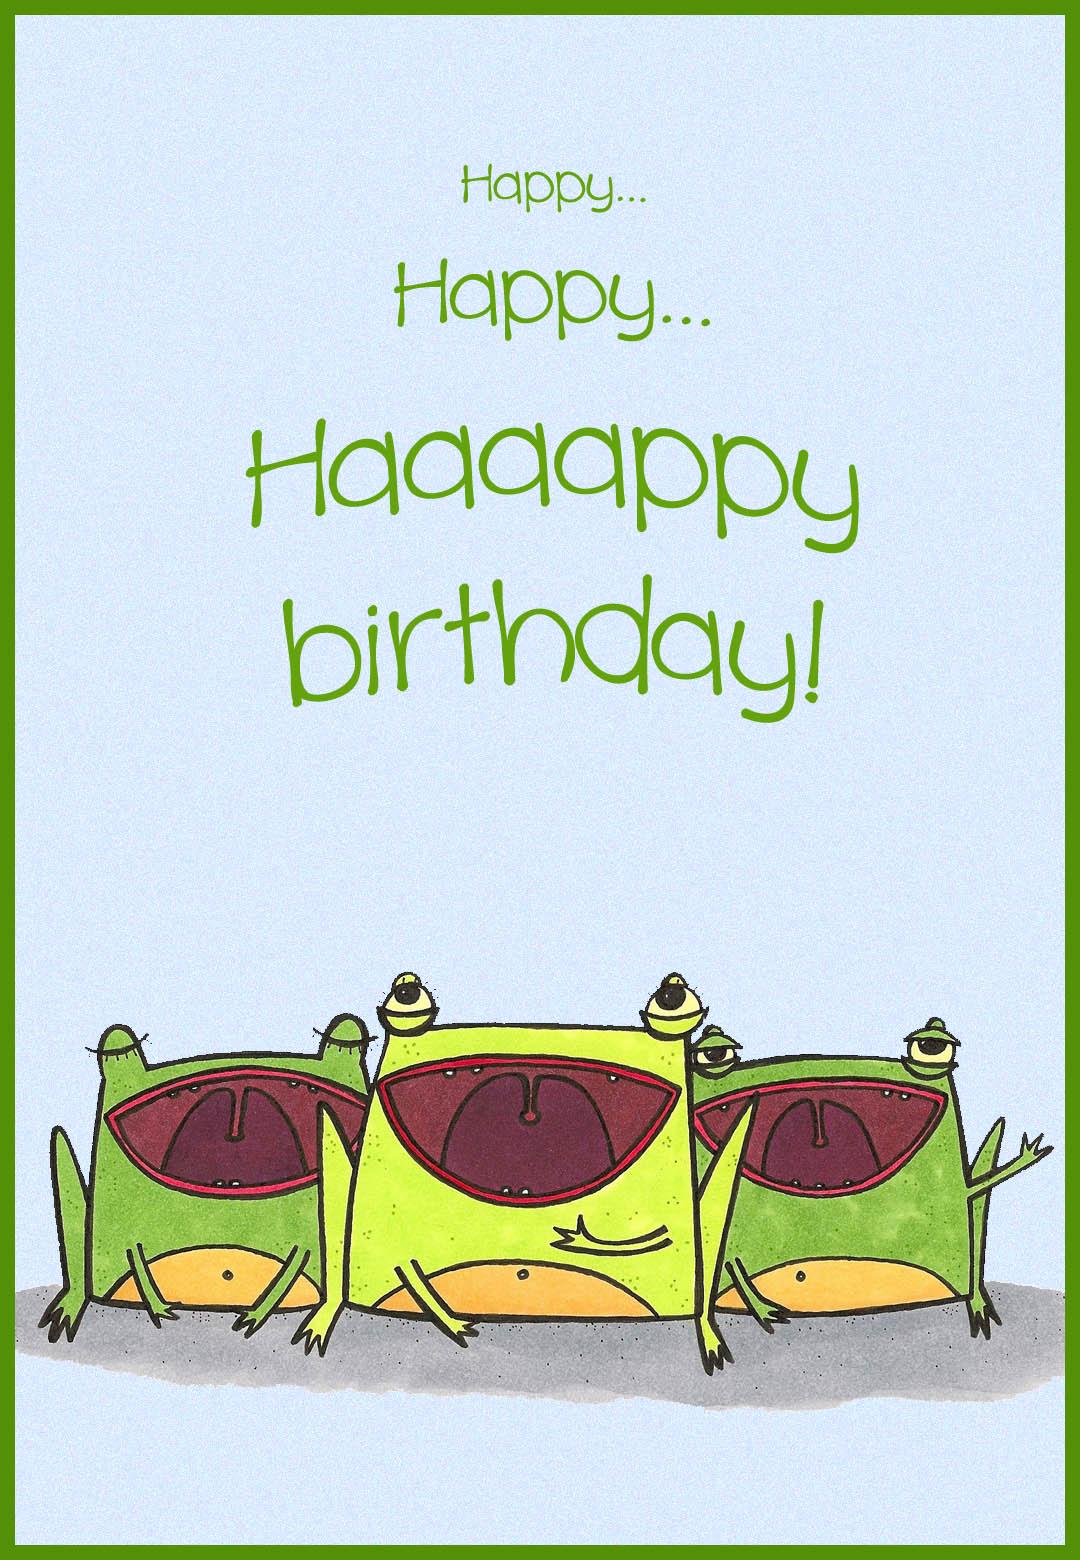 Happy Birthday Choir Free Birthday Card Greetings Island